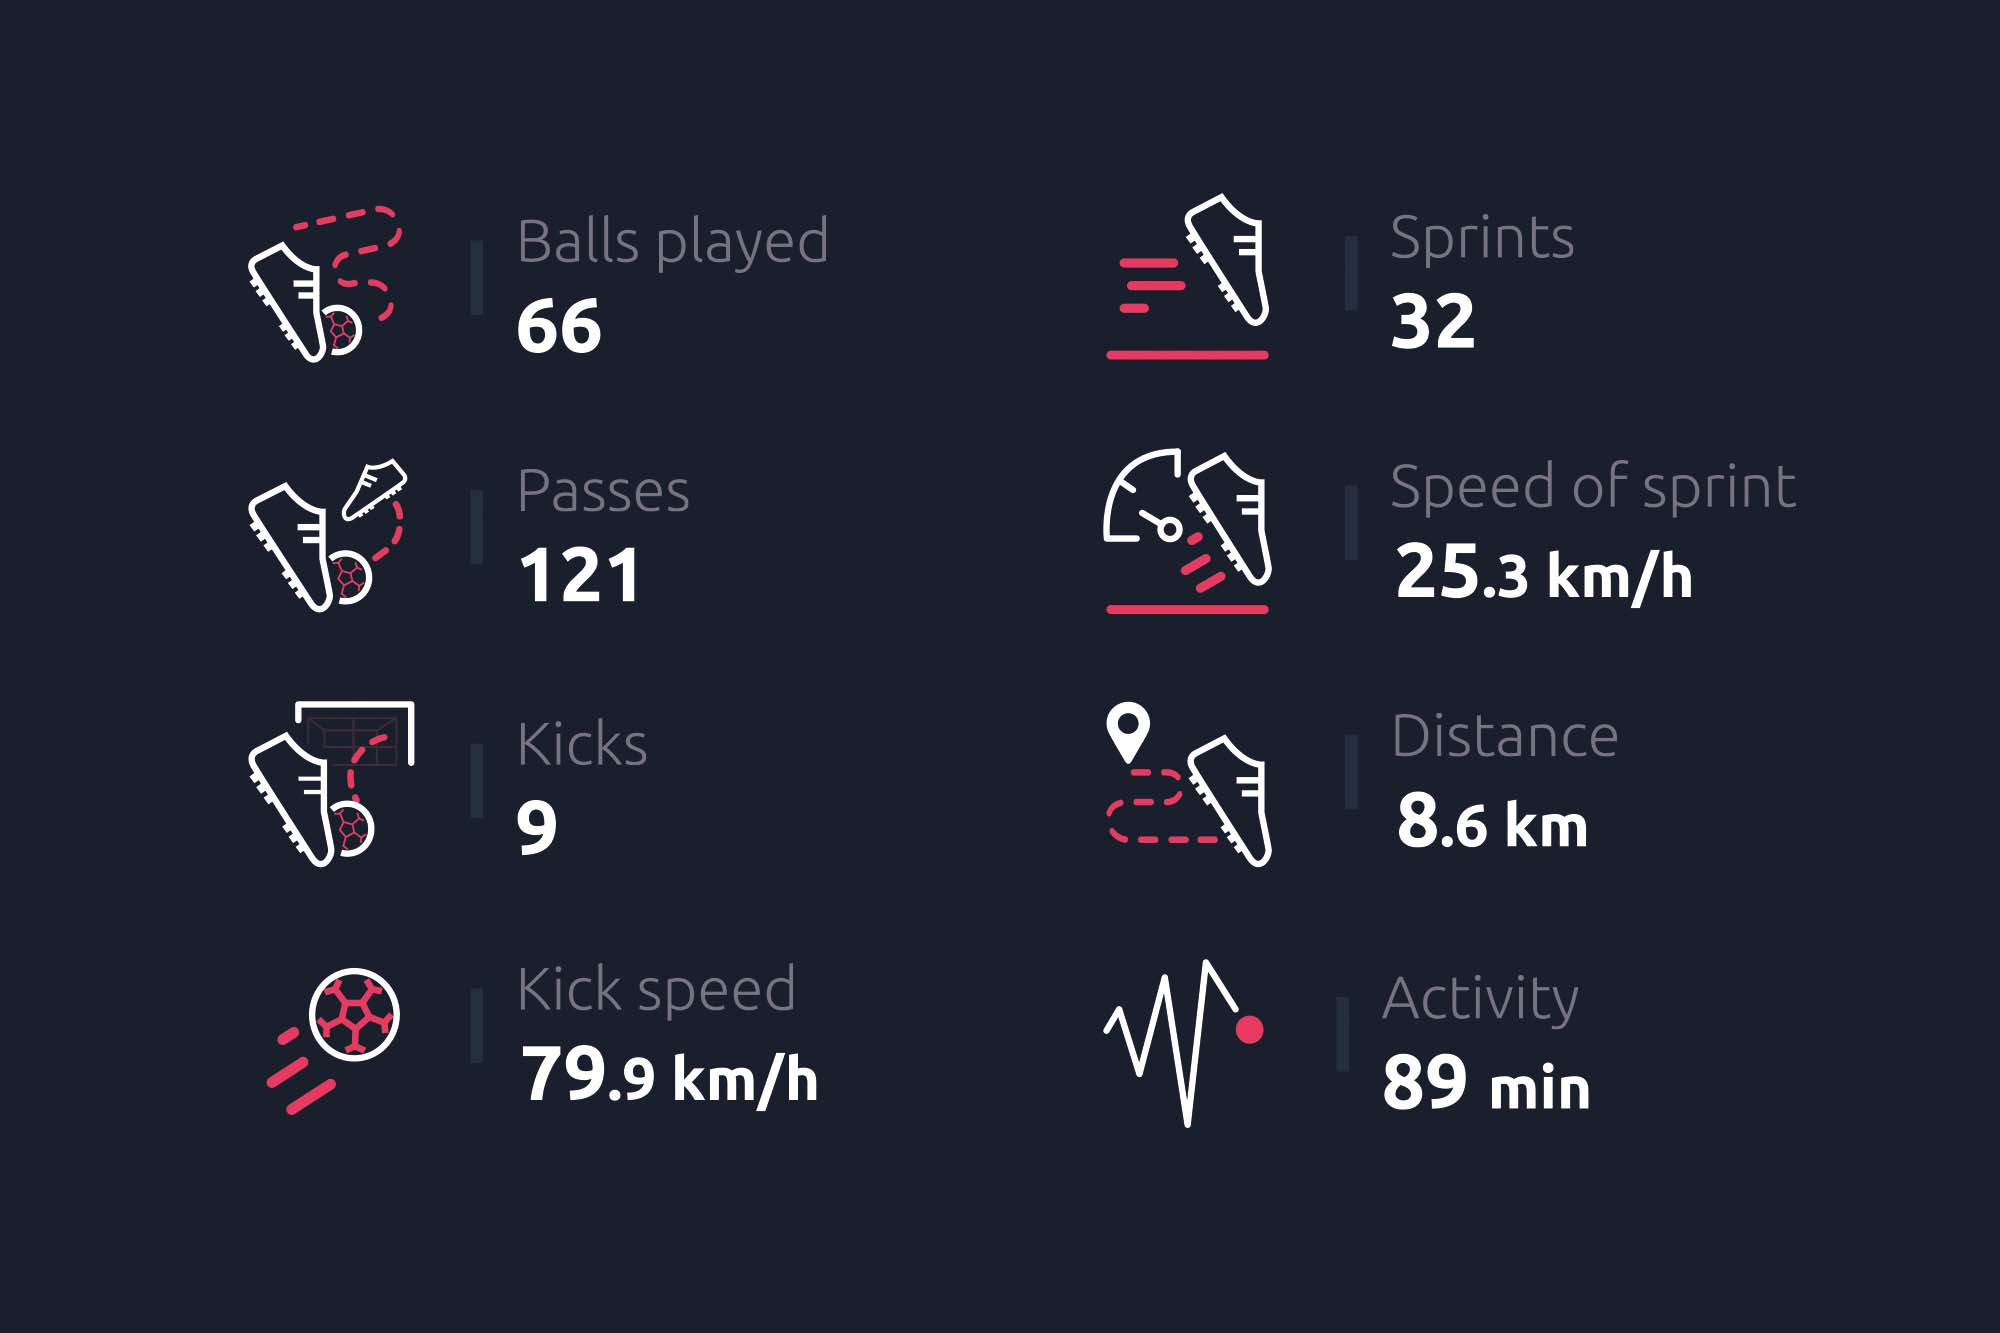 Soccer Statistics Icons